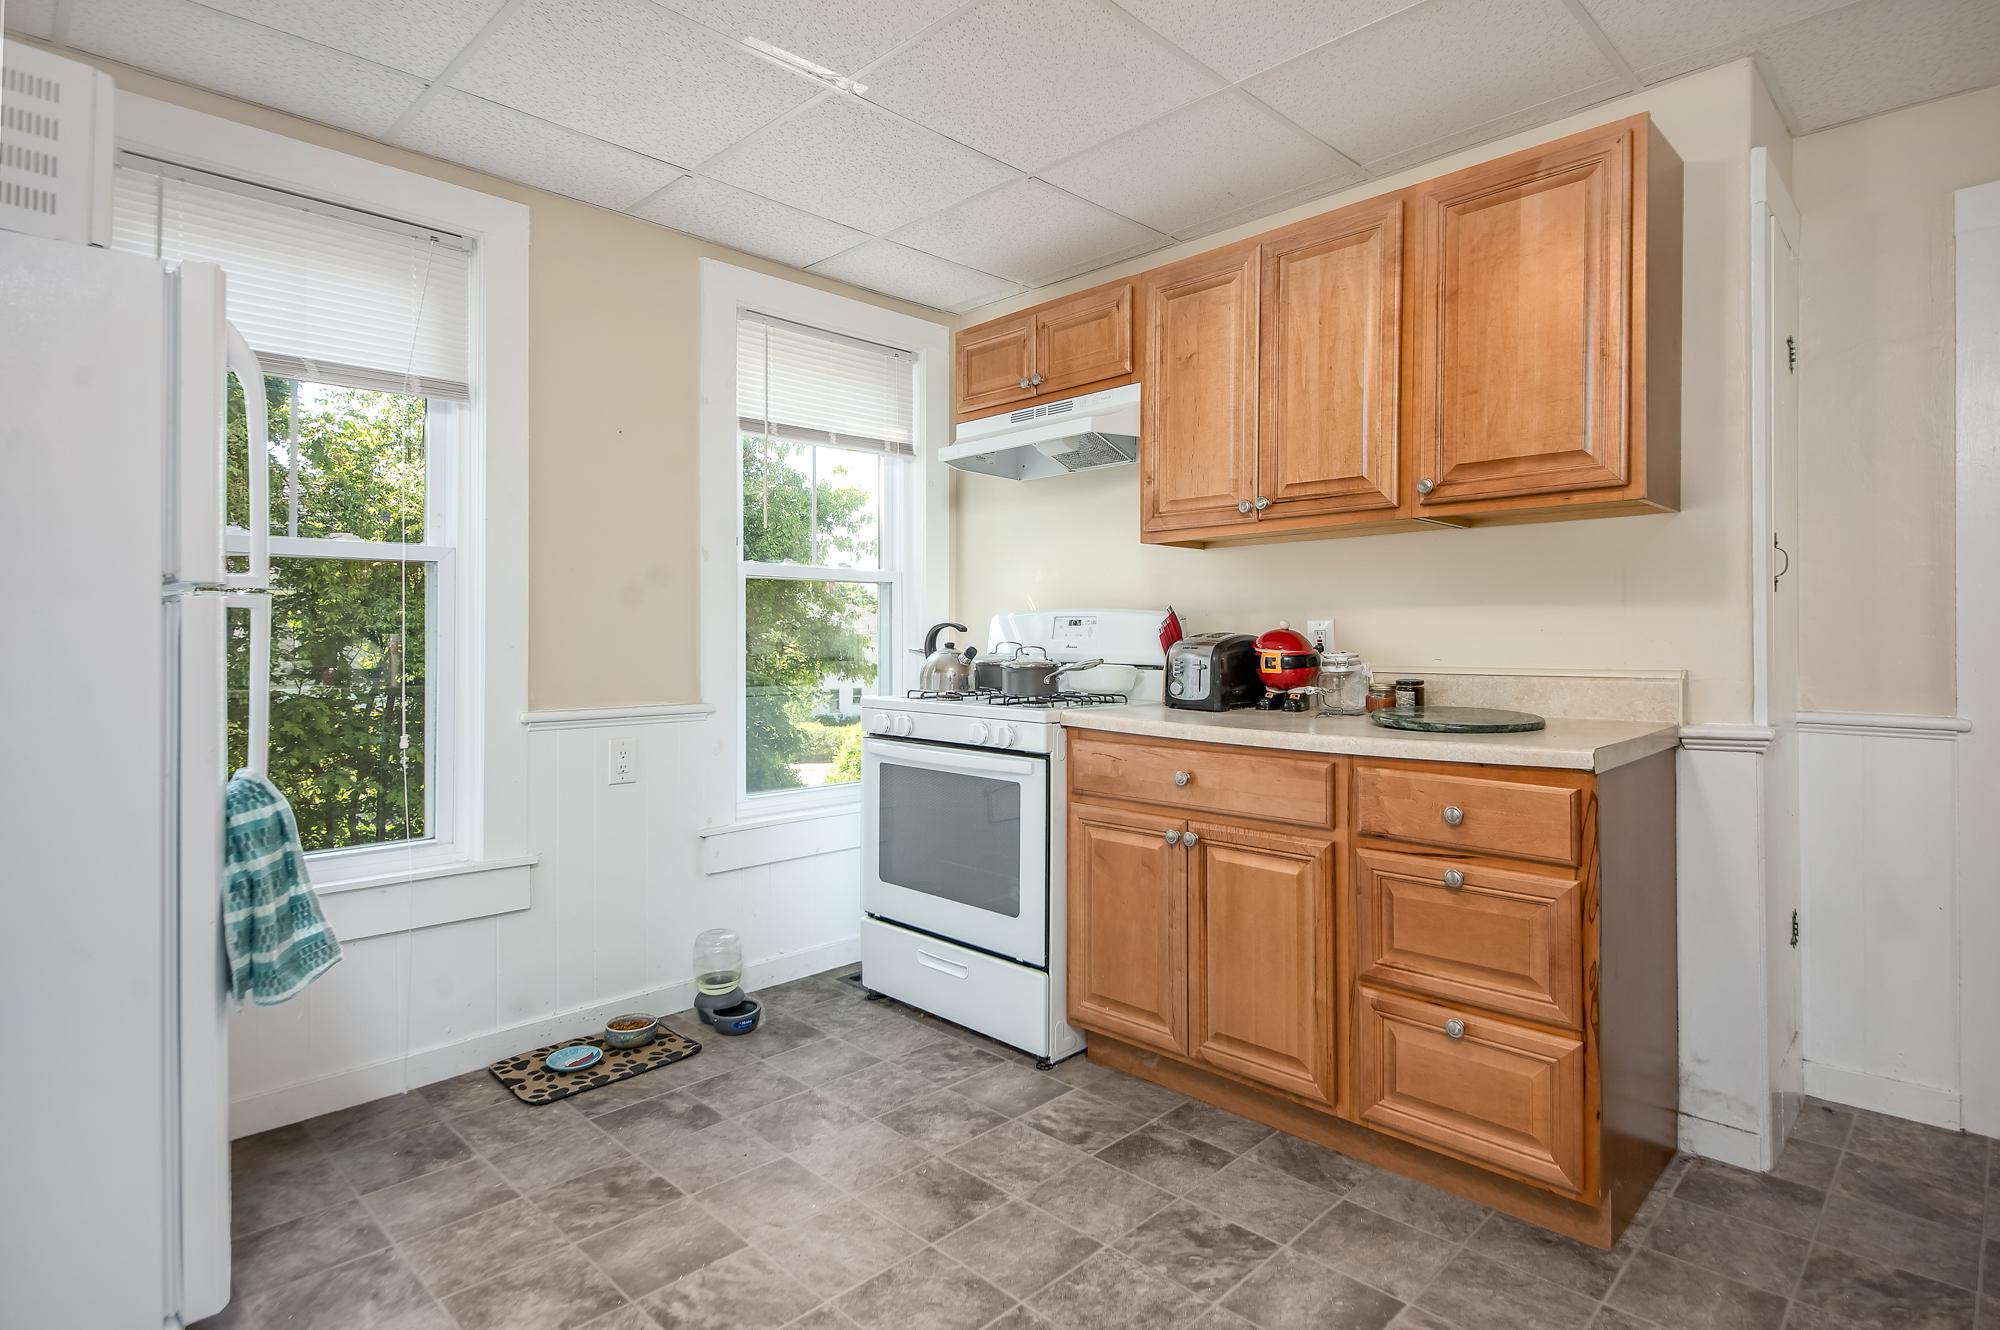 51-53 Prospect-kitchen13.jpg